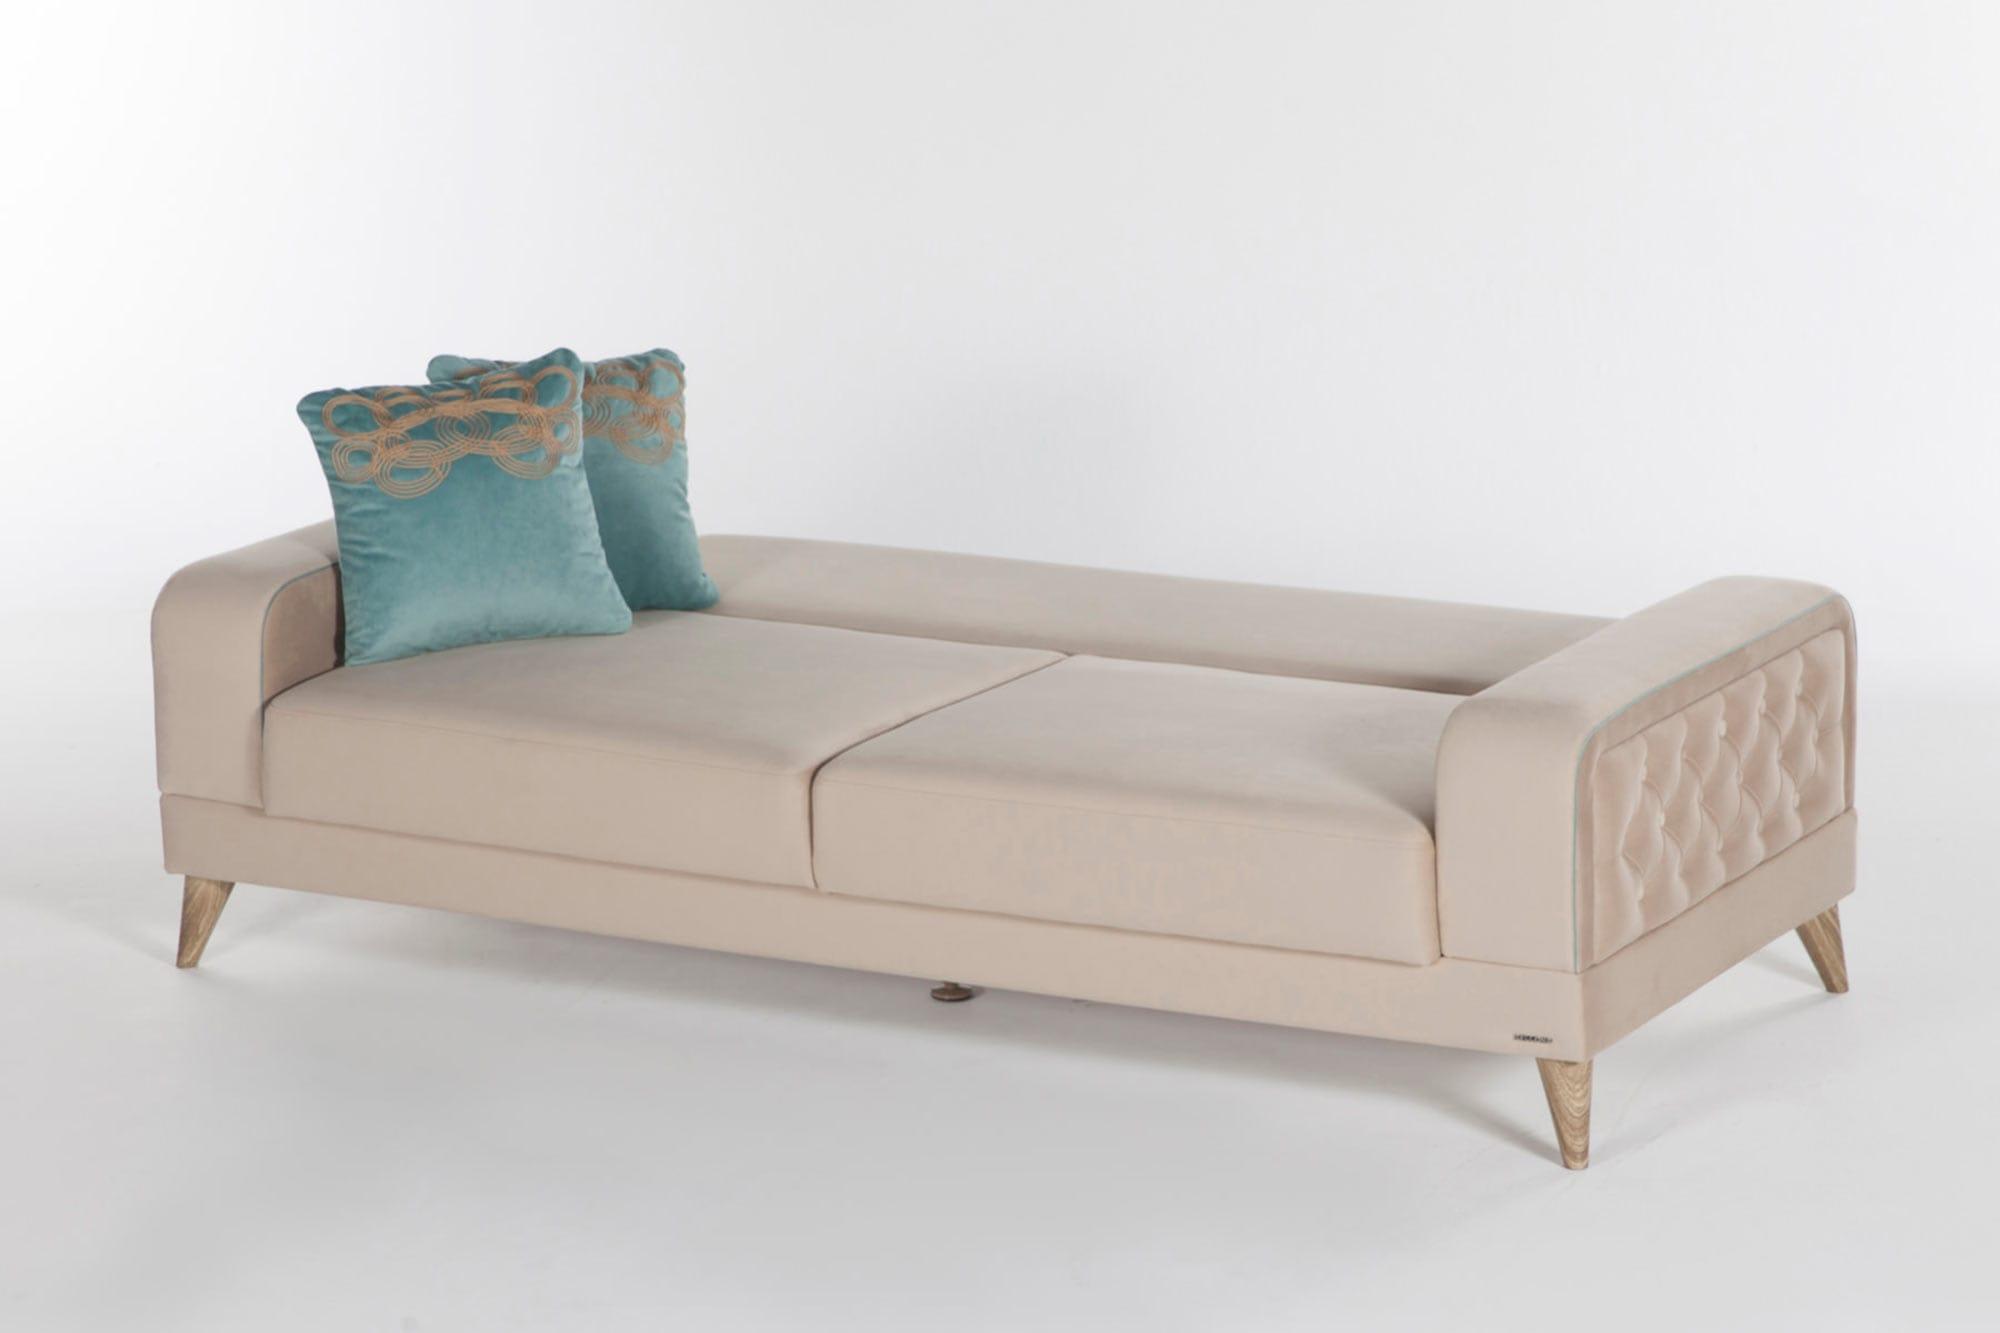 Vienza Lilyum Cream Convertible Sofa Bed by Istikbal Furniture